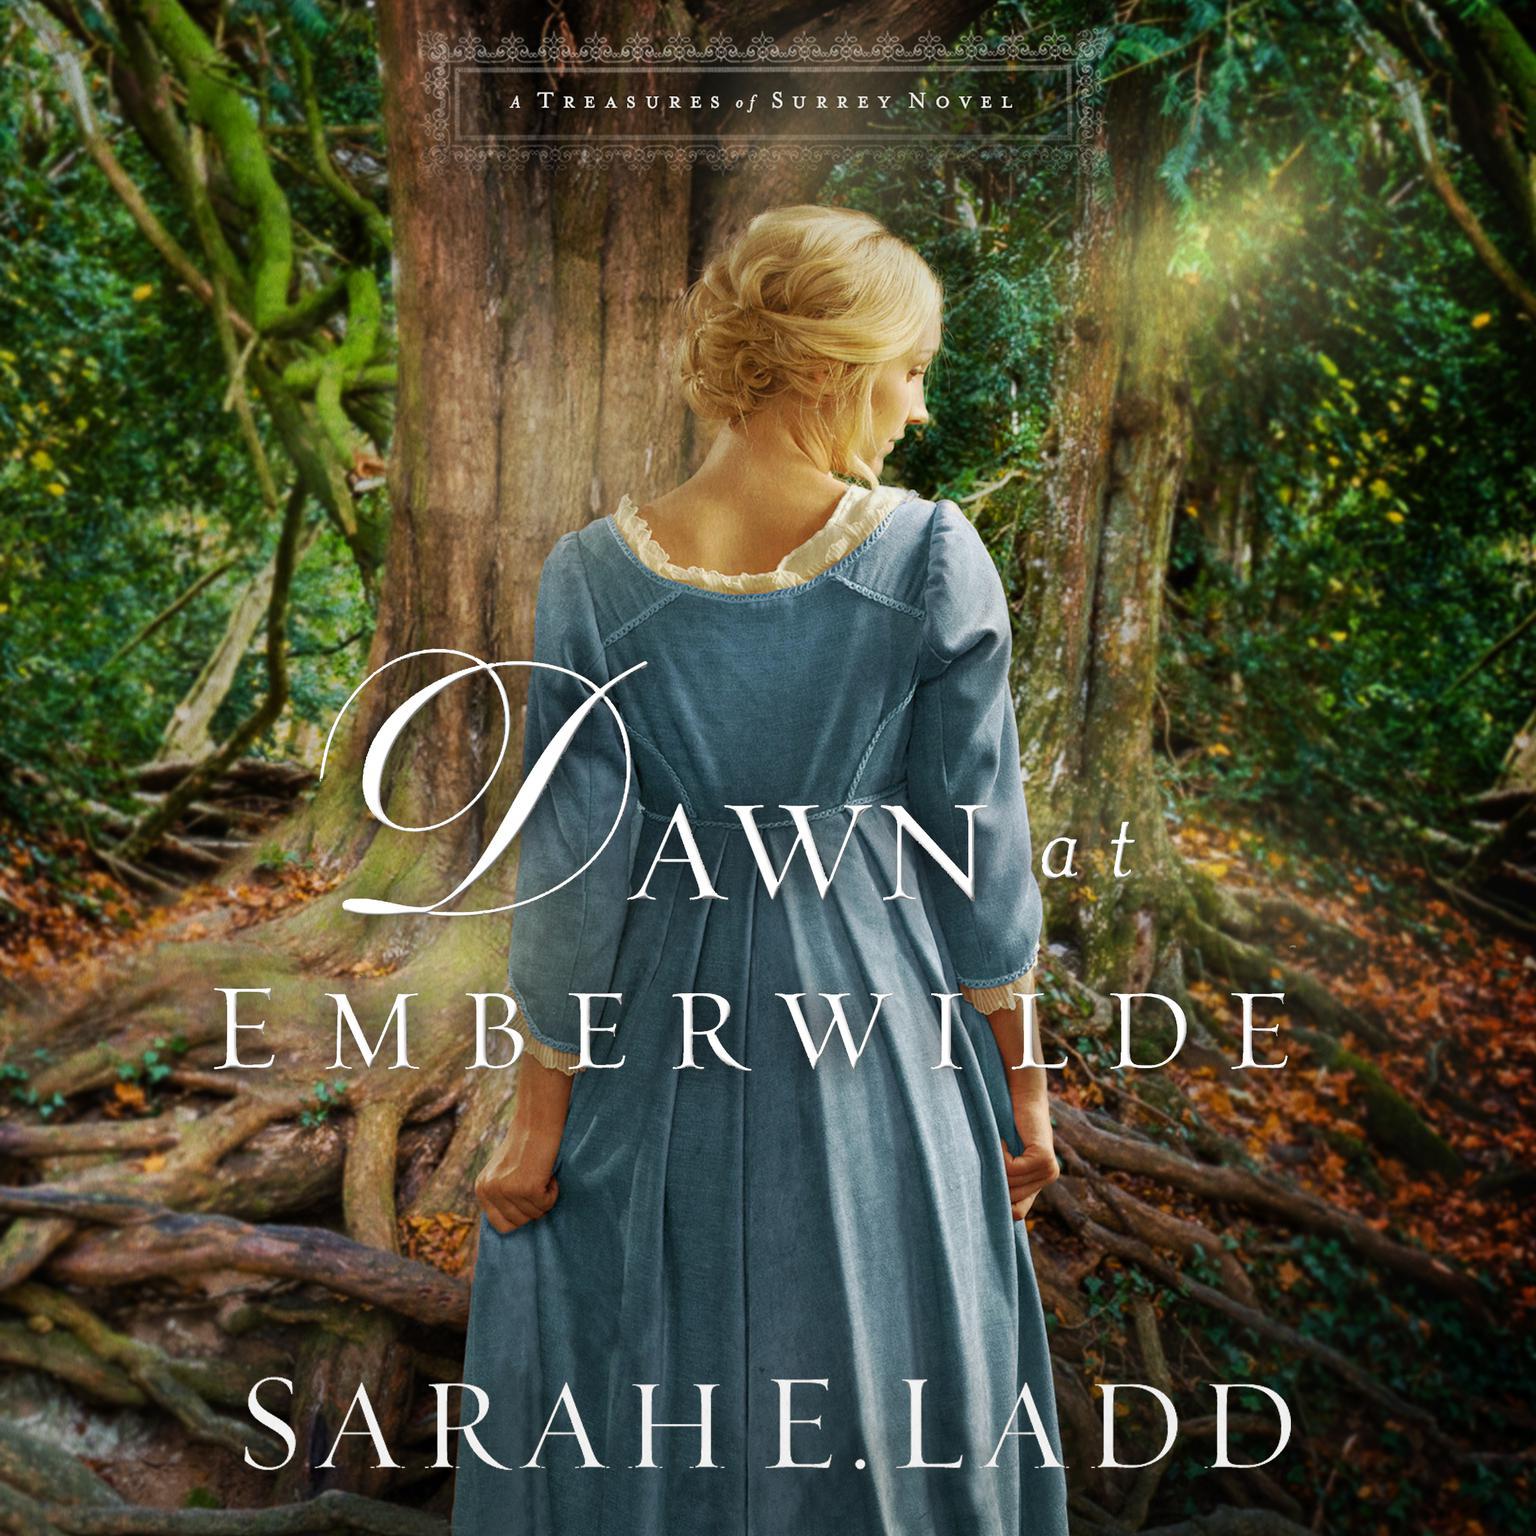 Dawn at Emberwilde Audiobook, by Sarah E. Ladd